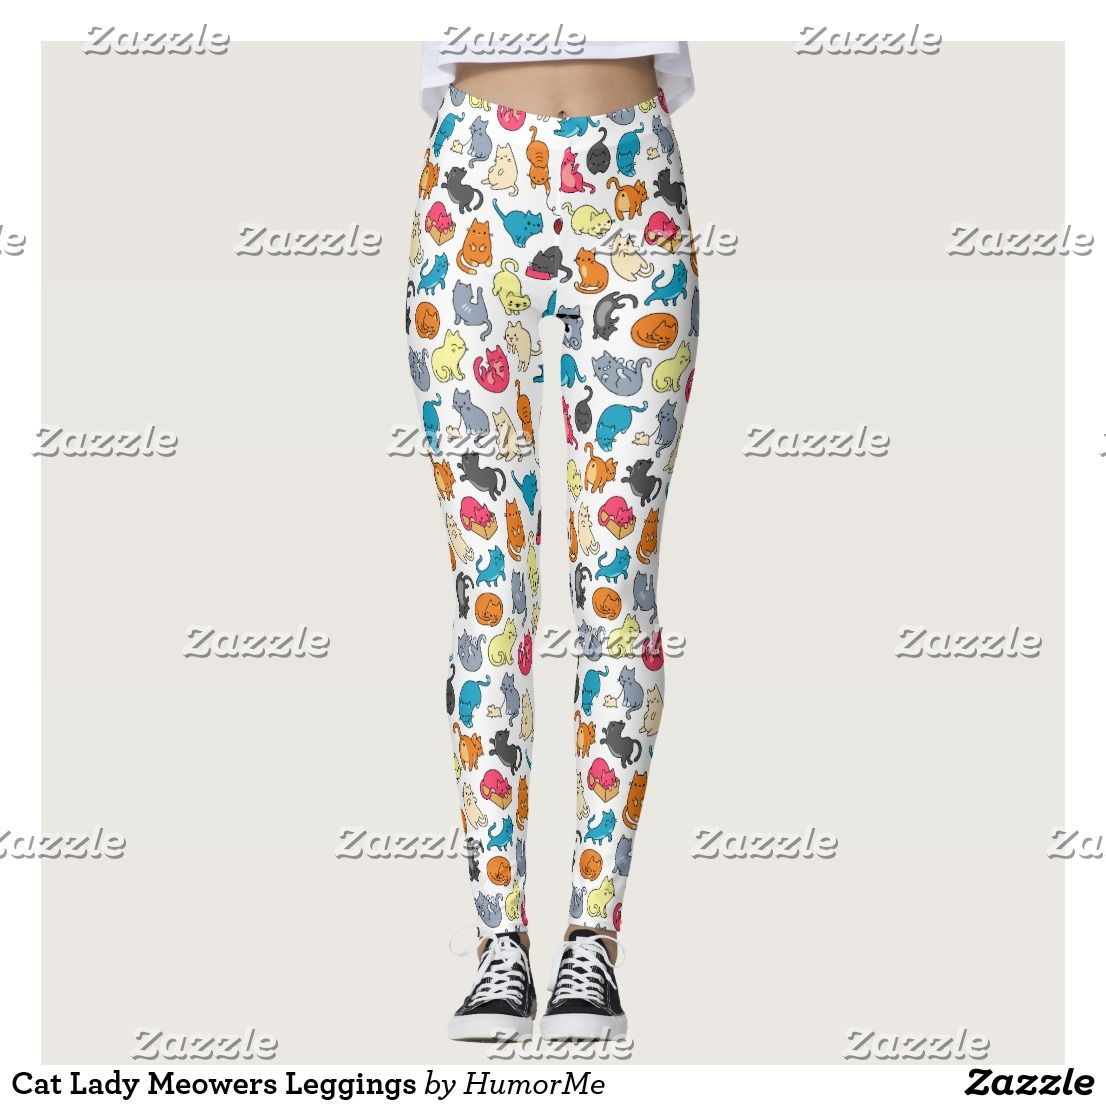 Cat Lady Meowers Leggings